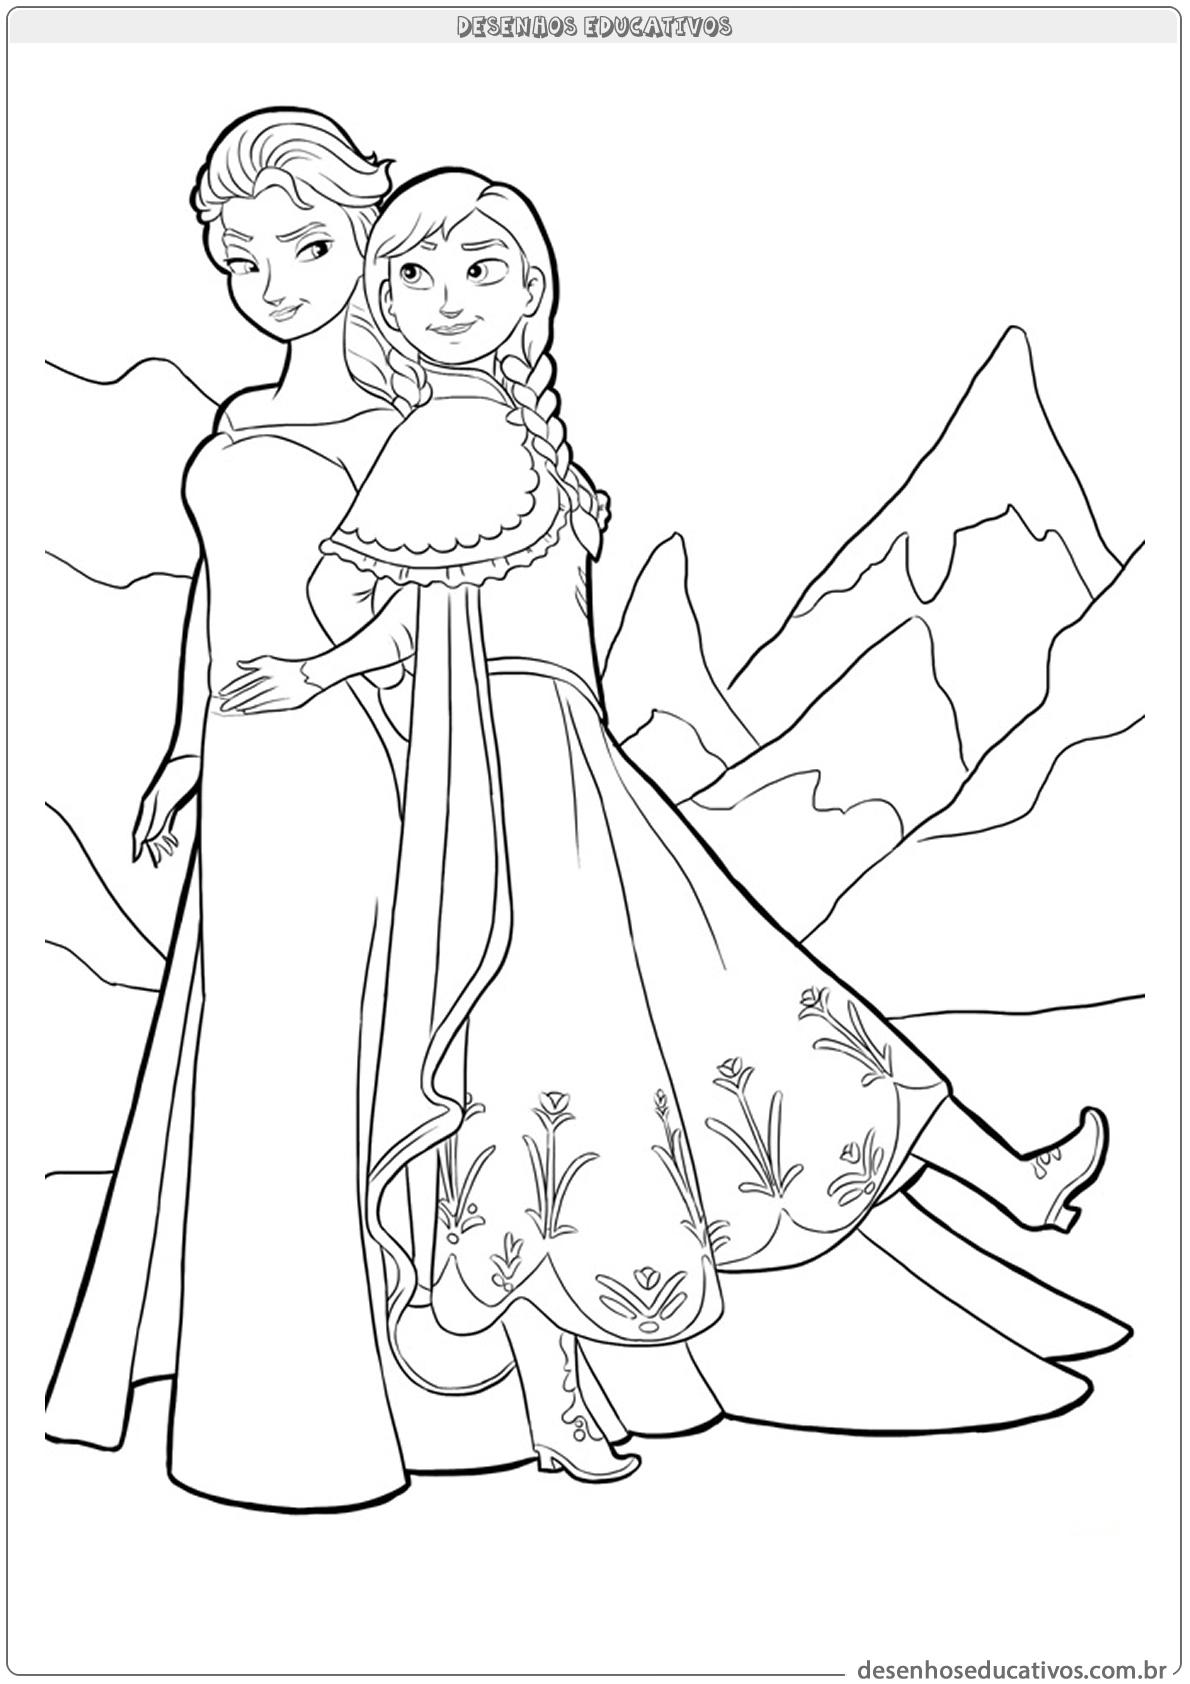 Desenhos Educativos Para Colorir Da Frozen Irmas Desenhos Educativos